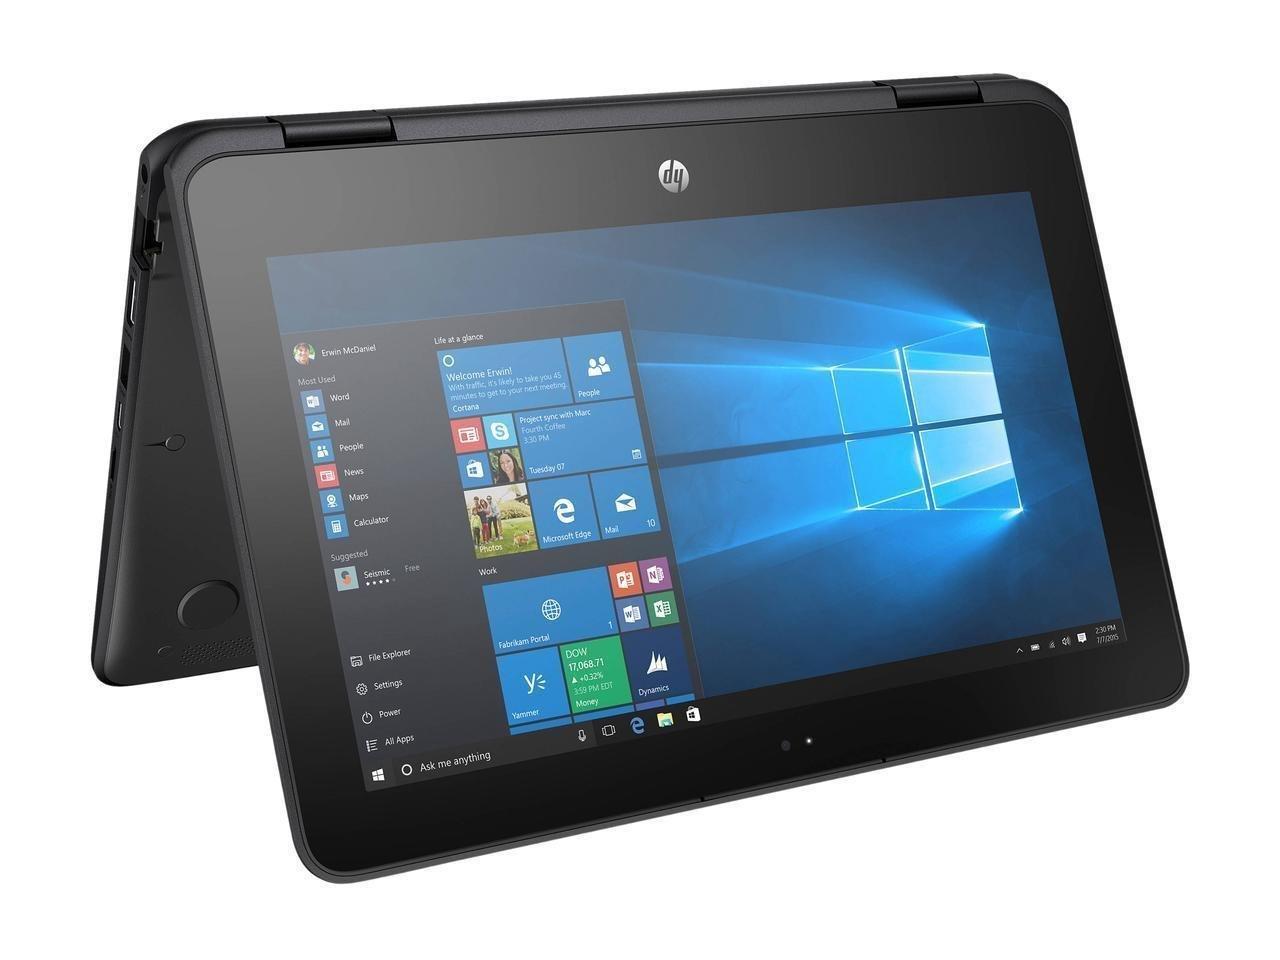 2018 Newest HP X360 ProBook Business 2-in-1 11.6' Touchscreen Laptop PC, Intel Celeron N3350 Dual-Core Processor, 4GB RAM, 64GB SSD, HDMI, Bluetooth, Webcam, WiFi, Windows 10 Pro